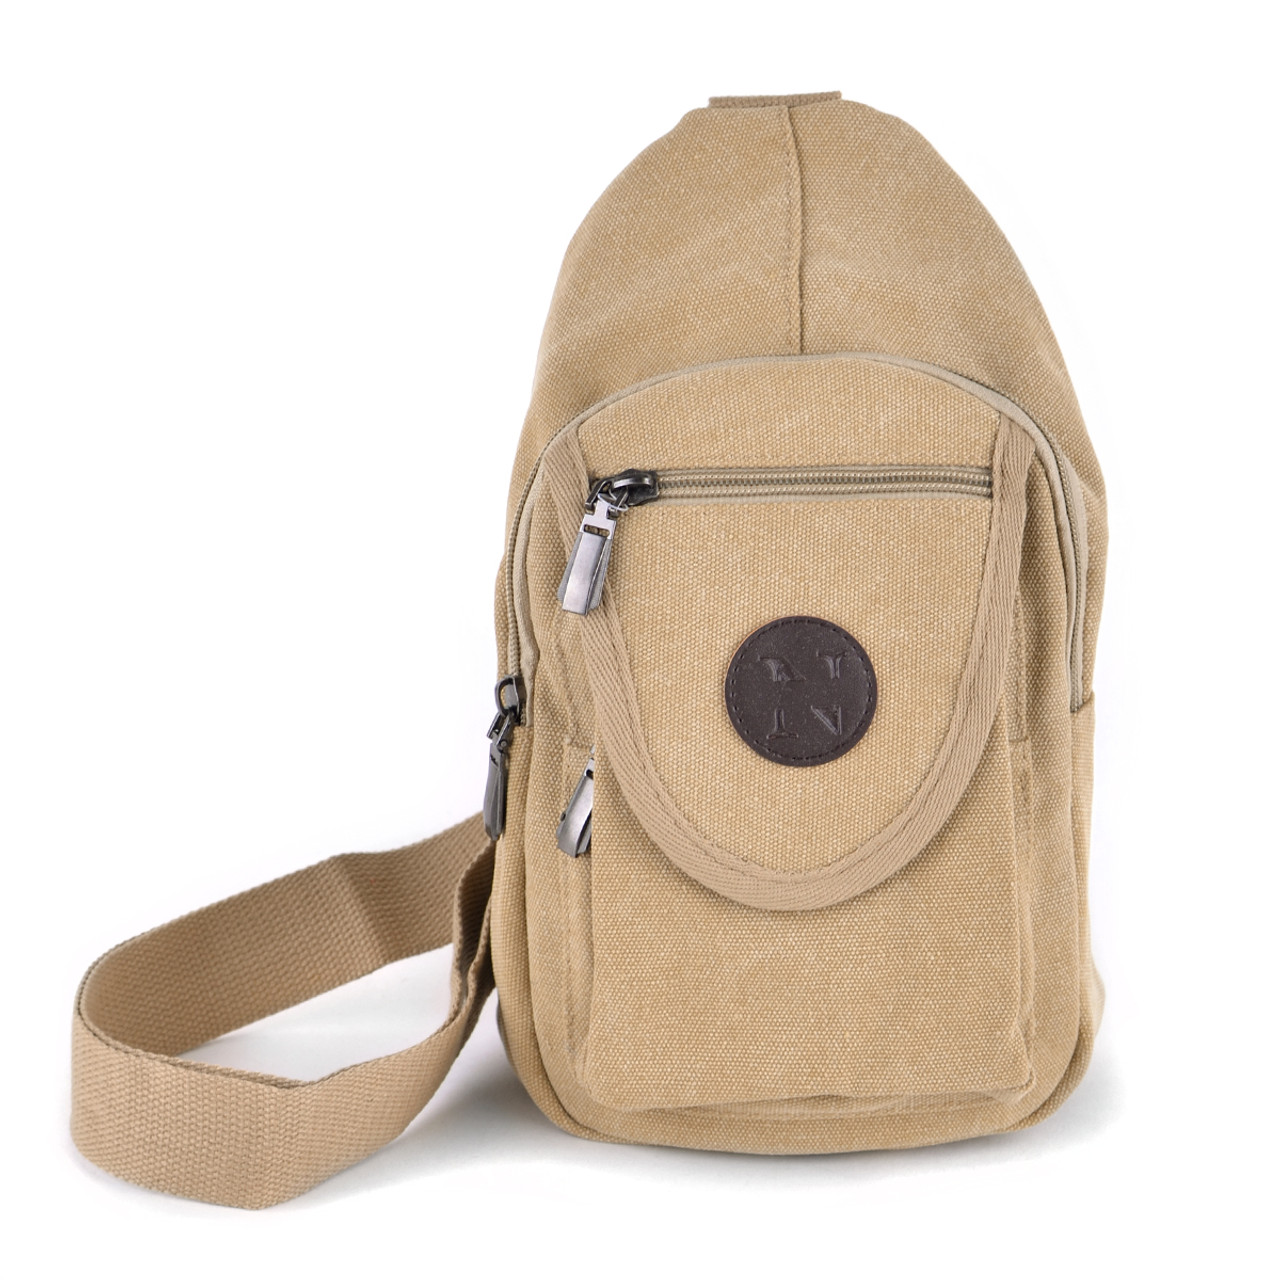 Nollia Women/'s Crossbody Canvas Sling Bag with Adjustable Strap